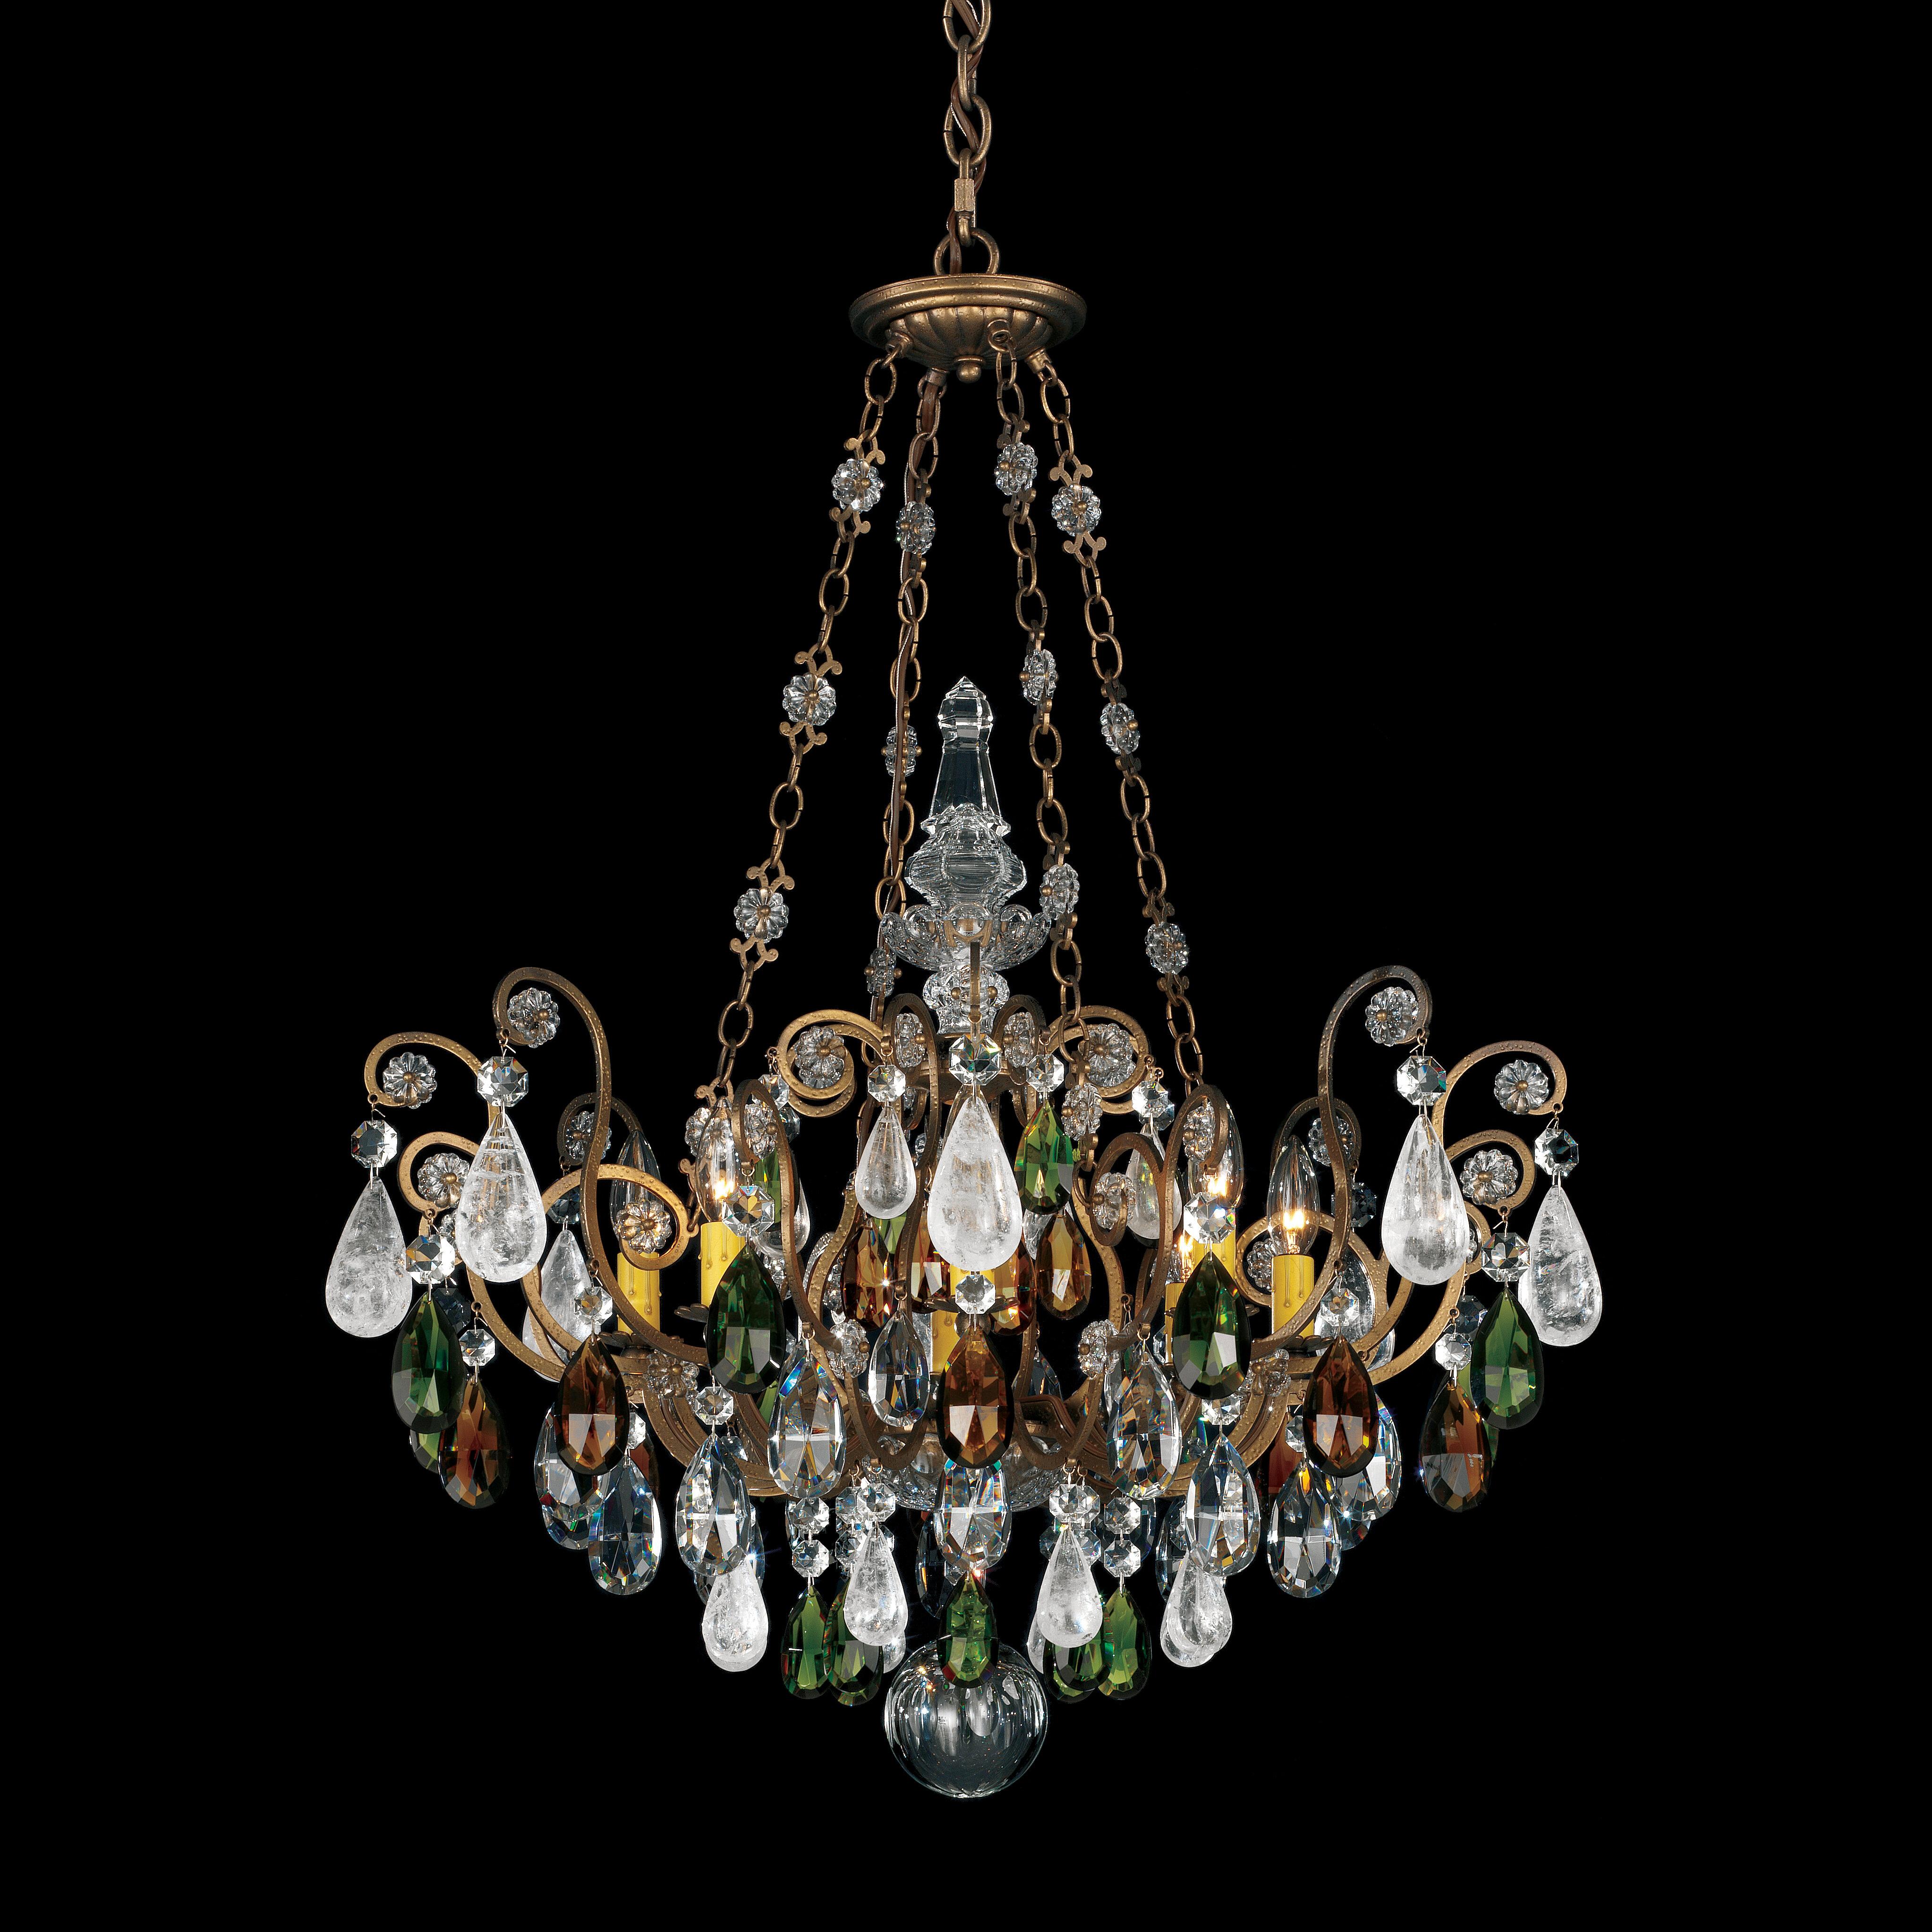 securemail r facie chandelier lus cage xml rock fr crystal en img